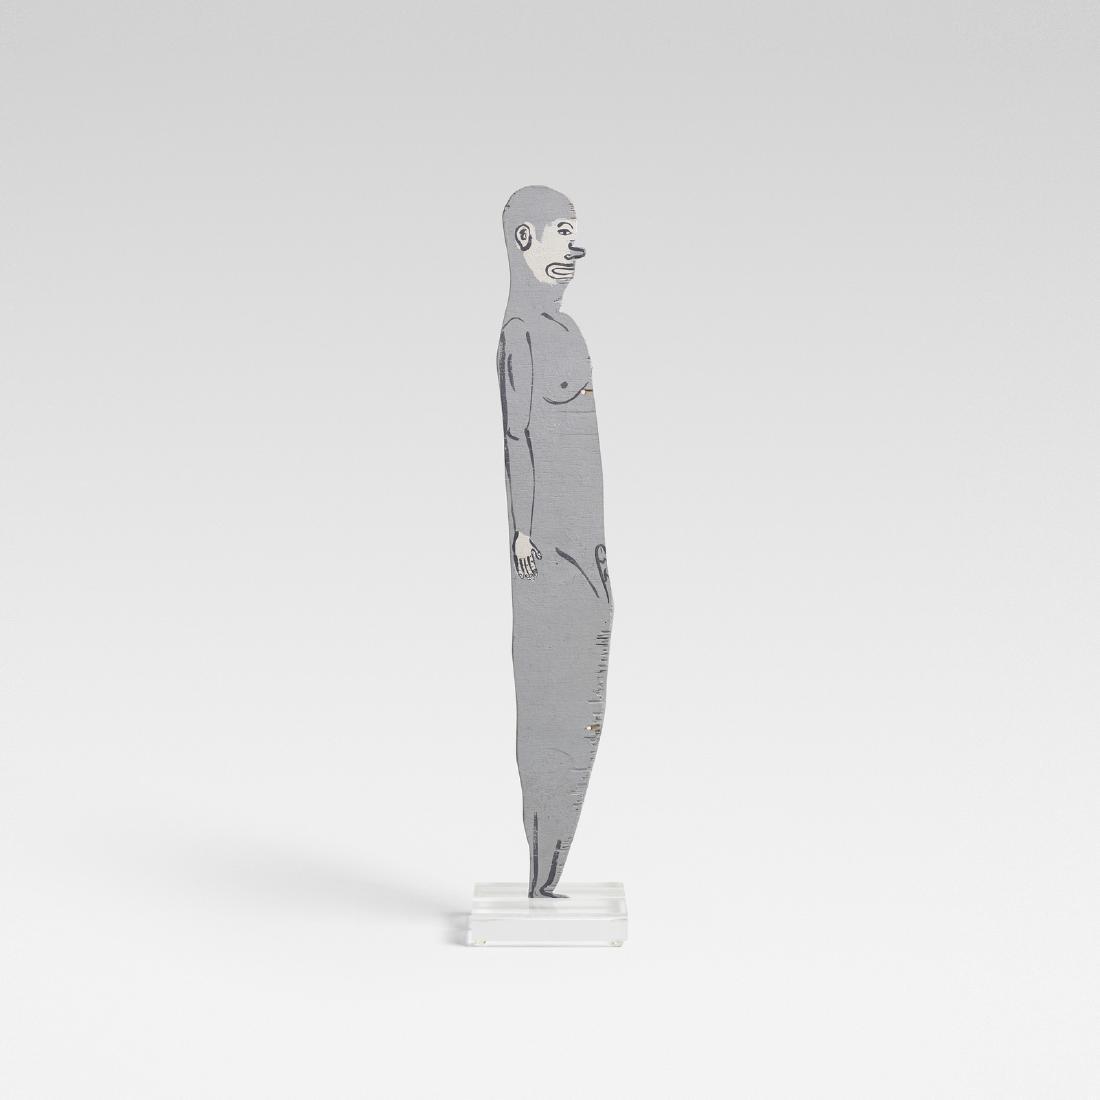 Chris Johanson, Untitled (Man)